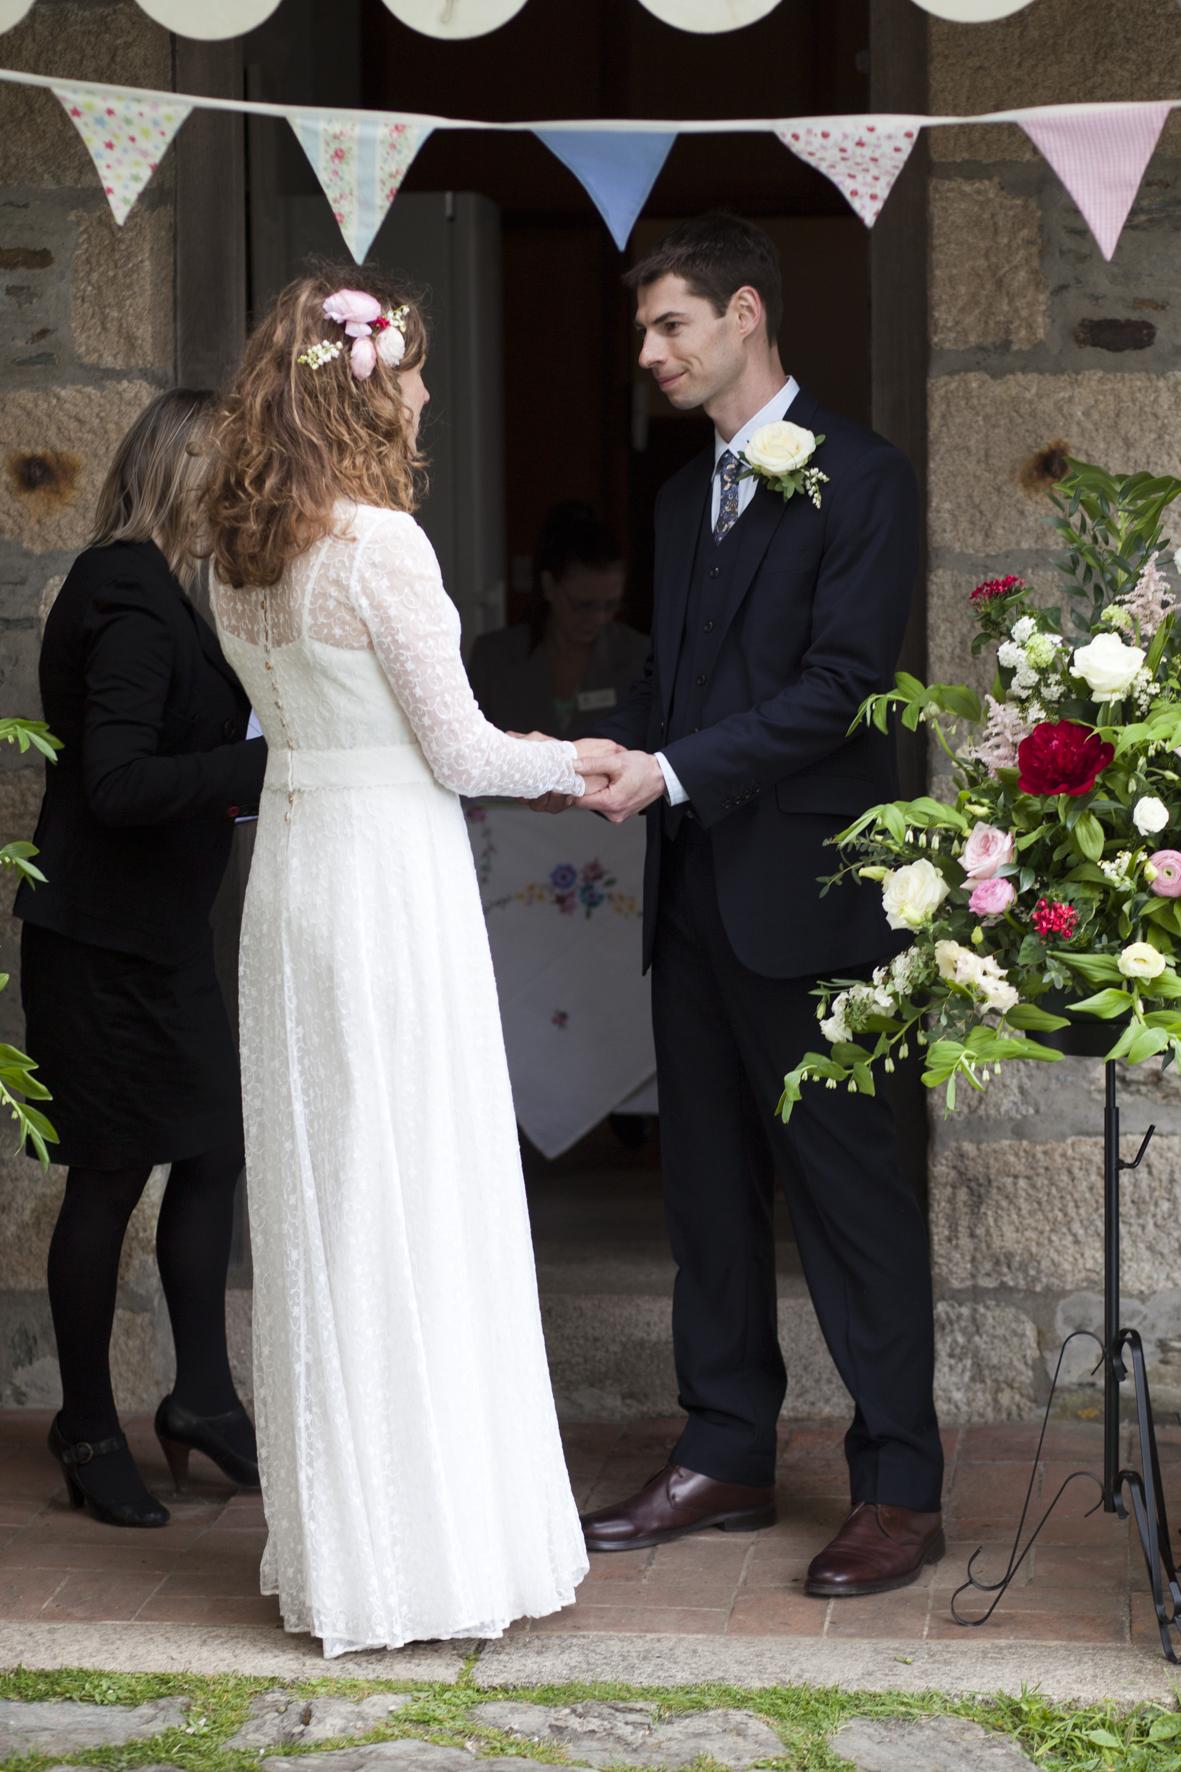 Wedding example_M&P__MG_3367_Claudia Leisinger.jpg